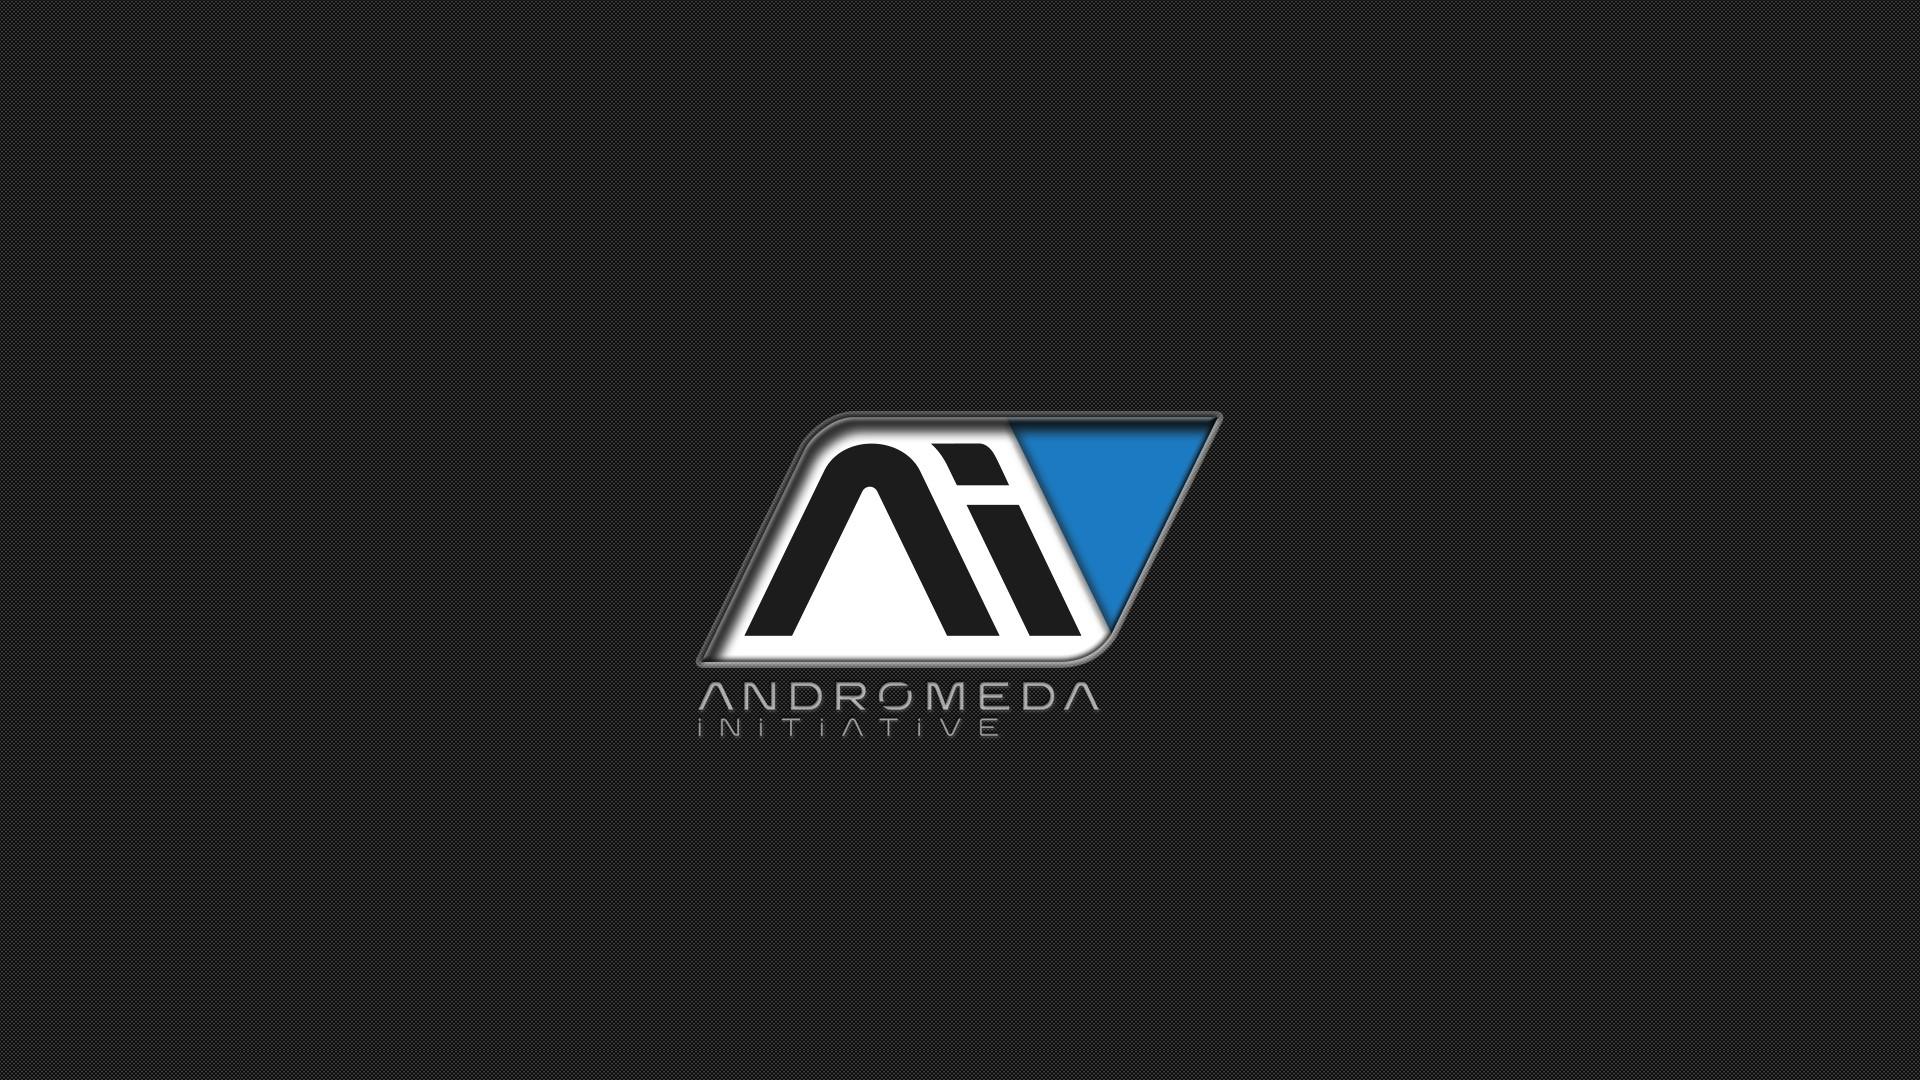 Wallpaper : artwork, text, logo, Mass Effect Andromeda, Andromeda